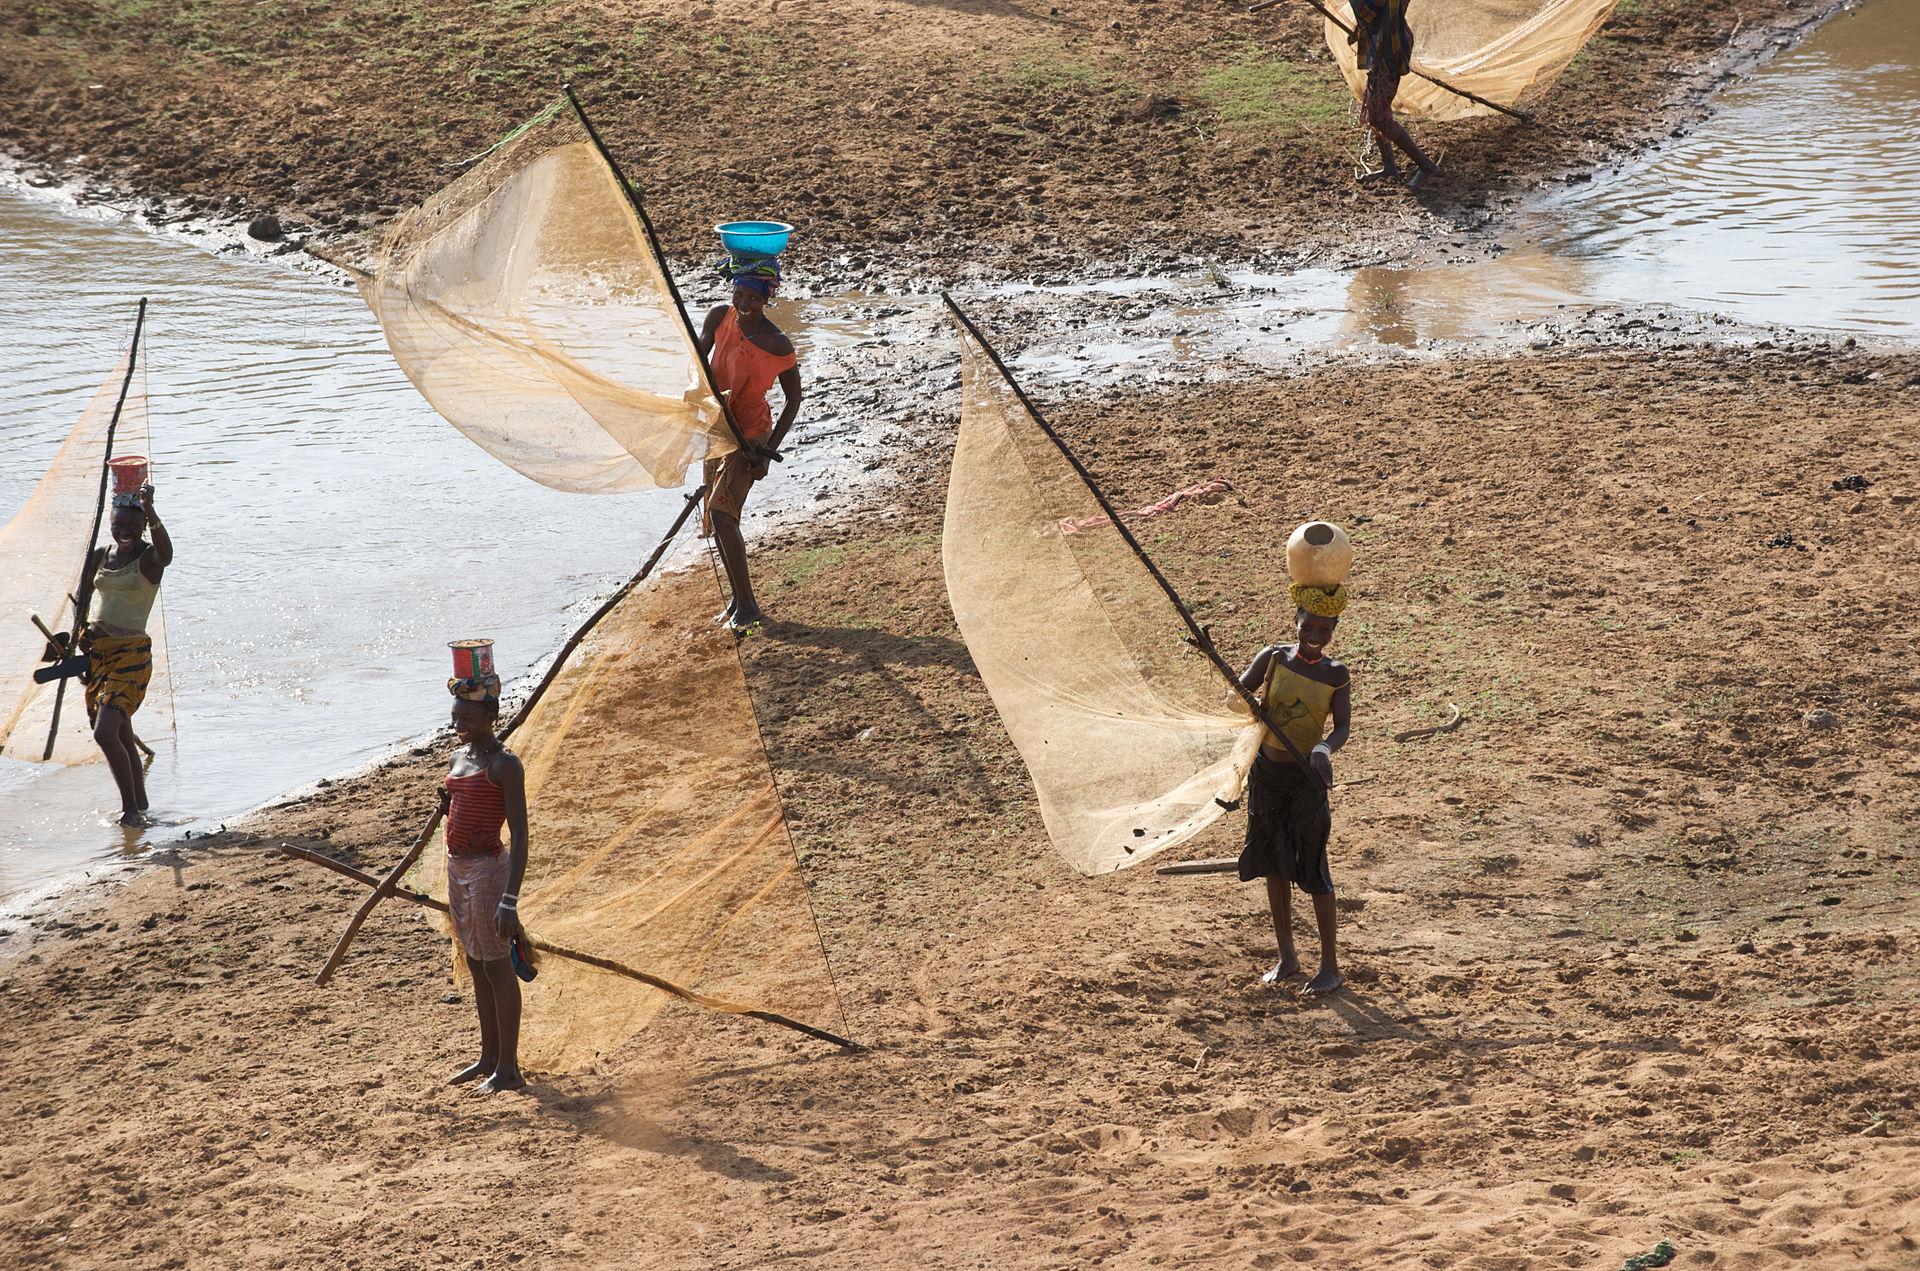 Malinke fisher women